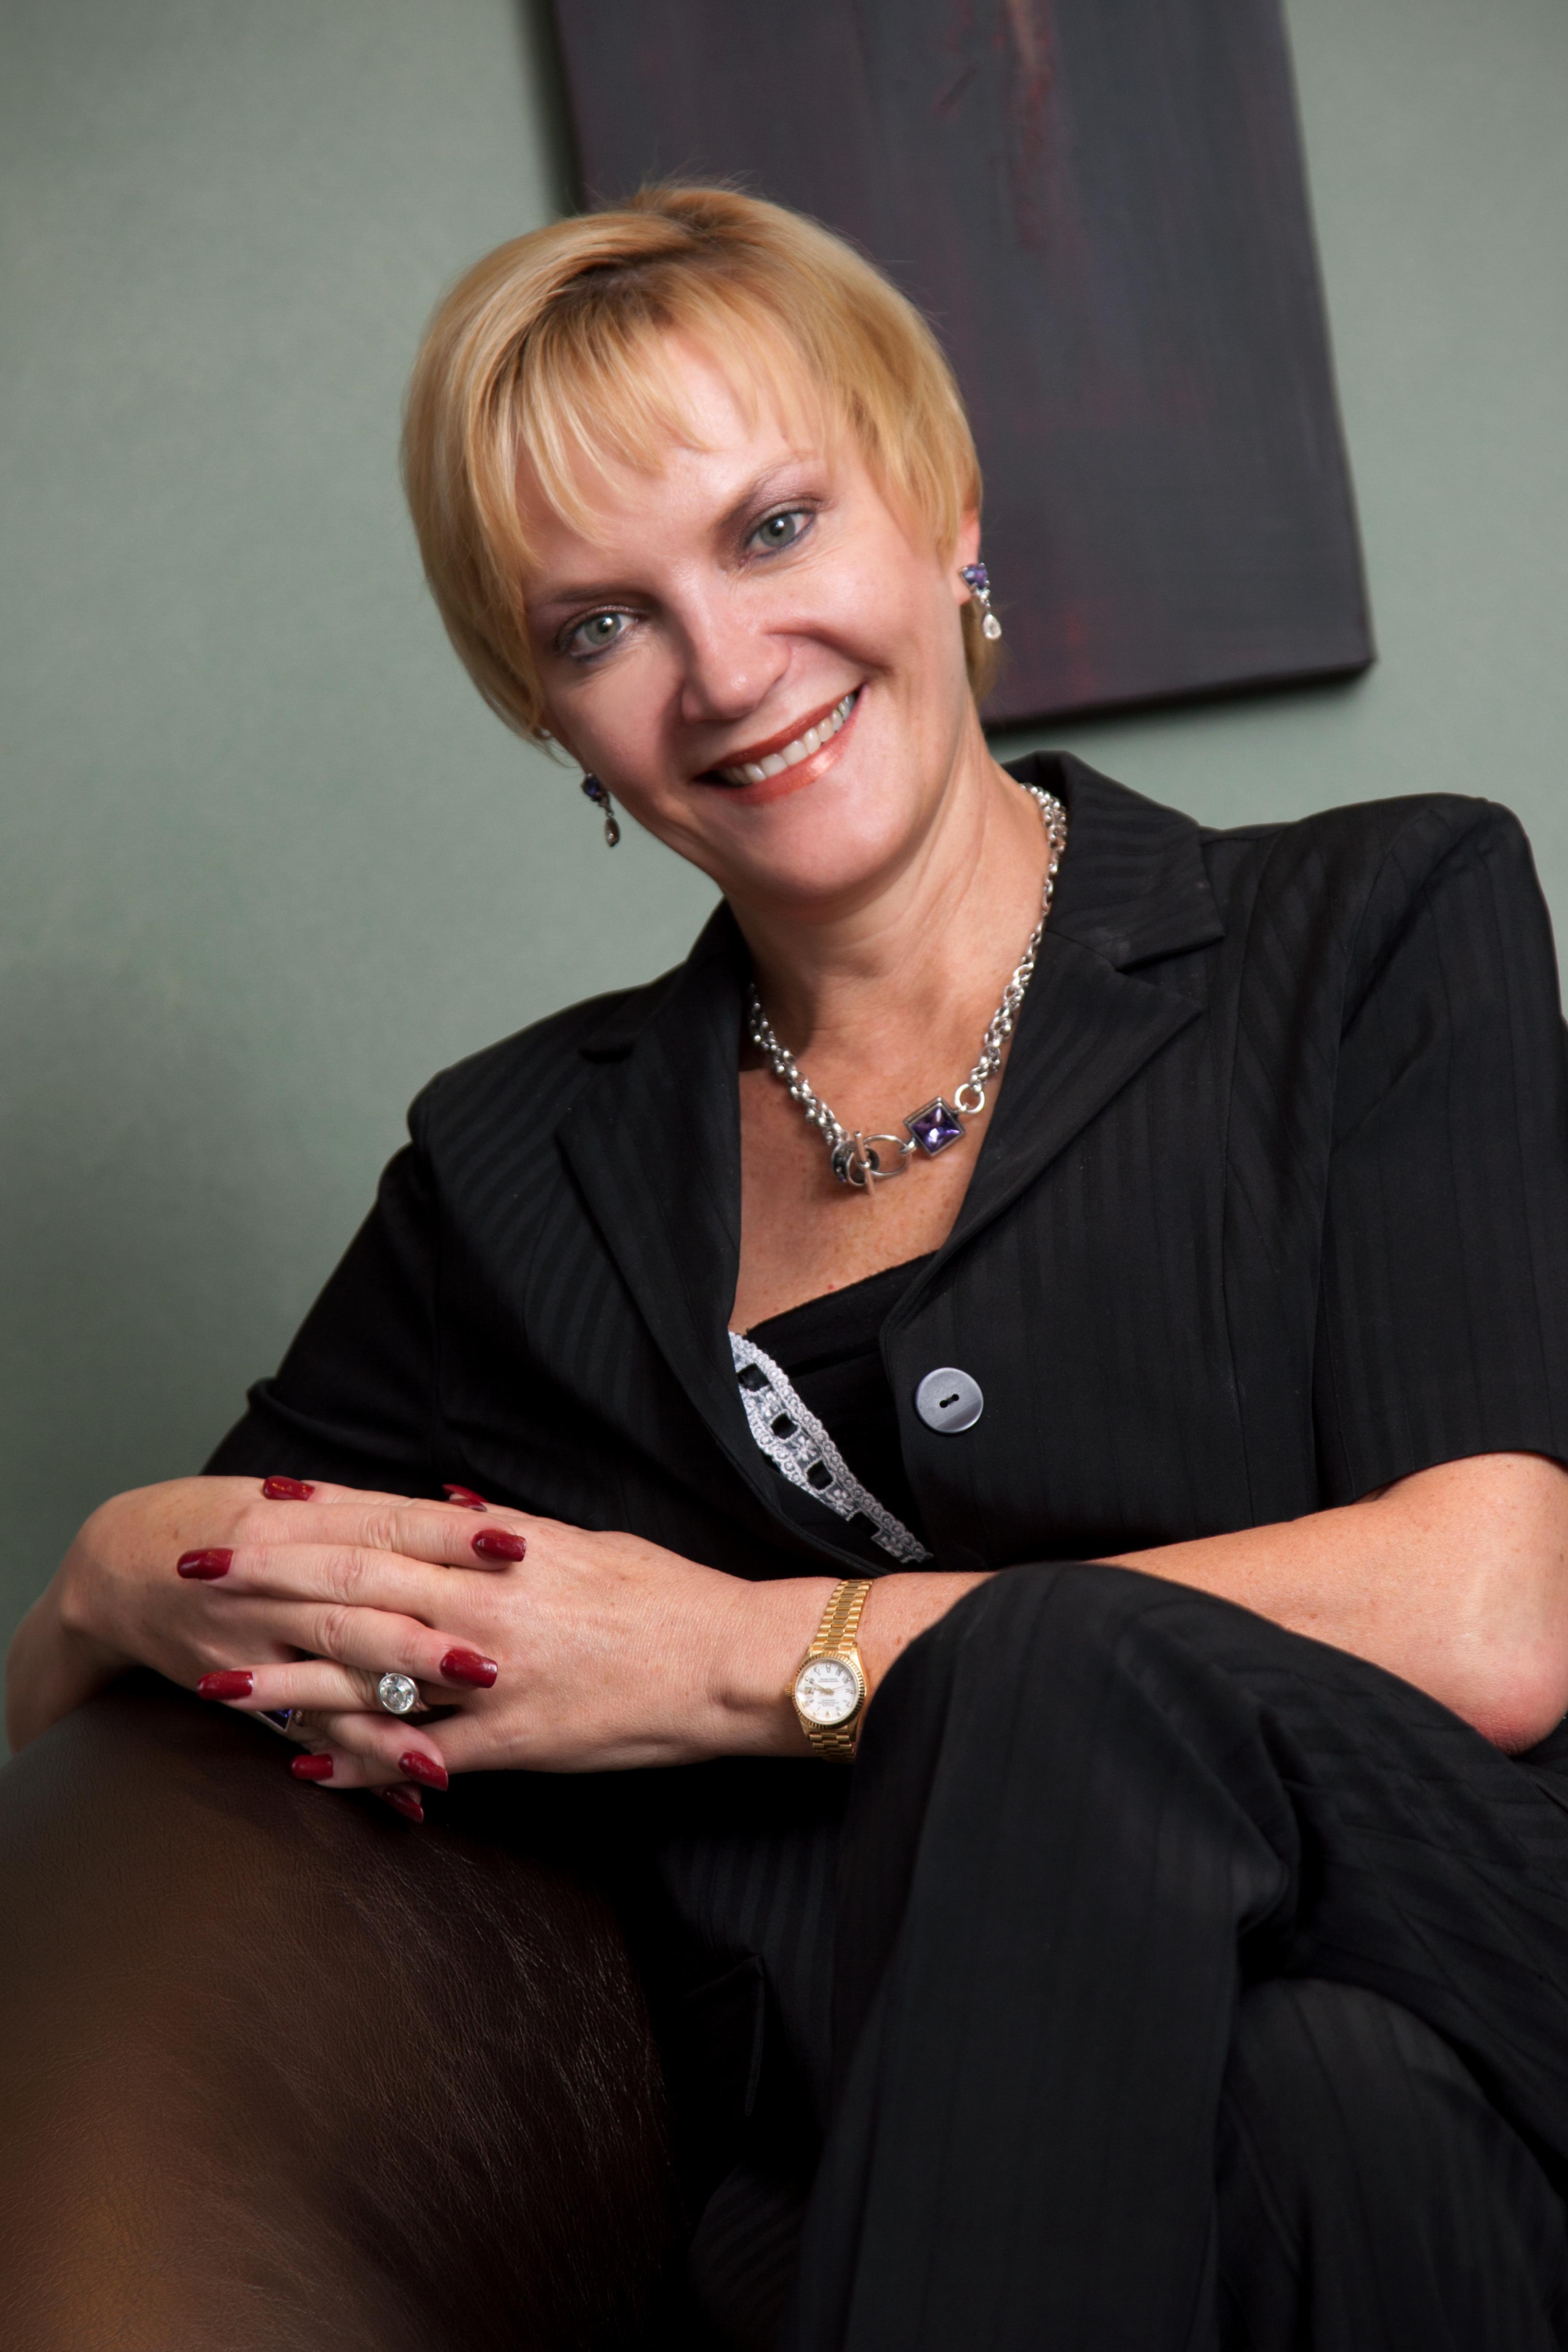 Antoinette Gmeiner